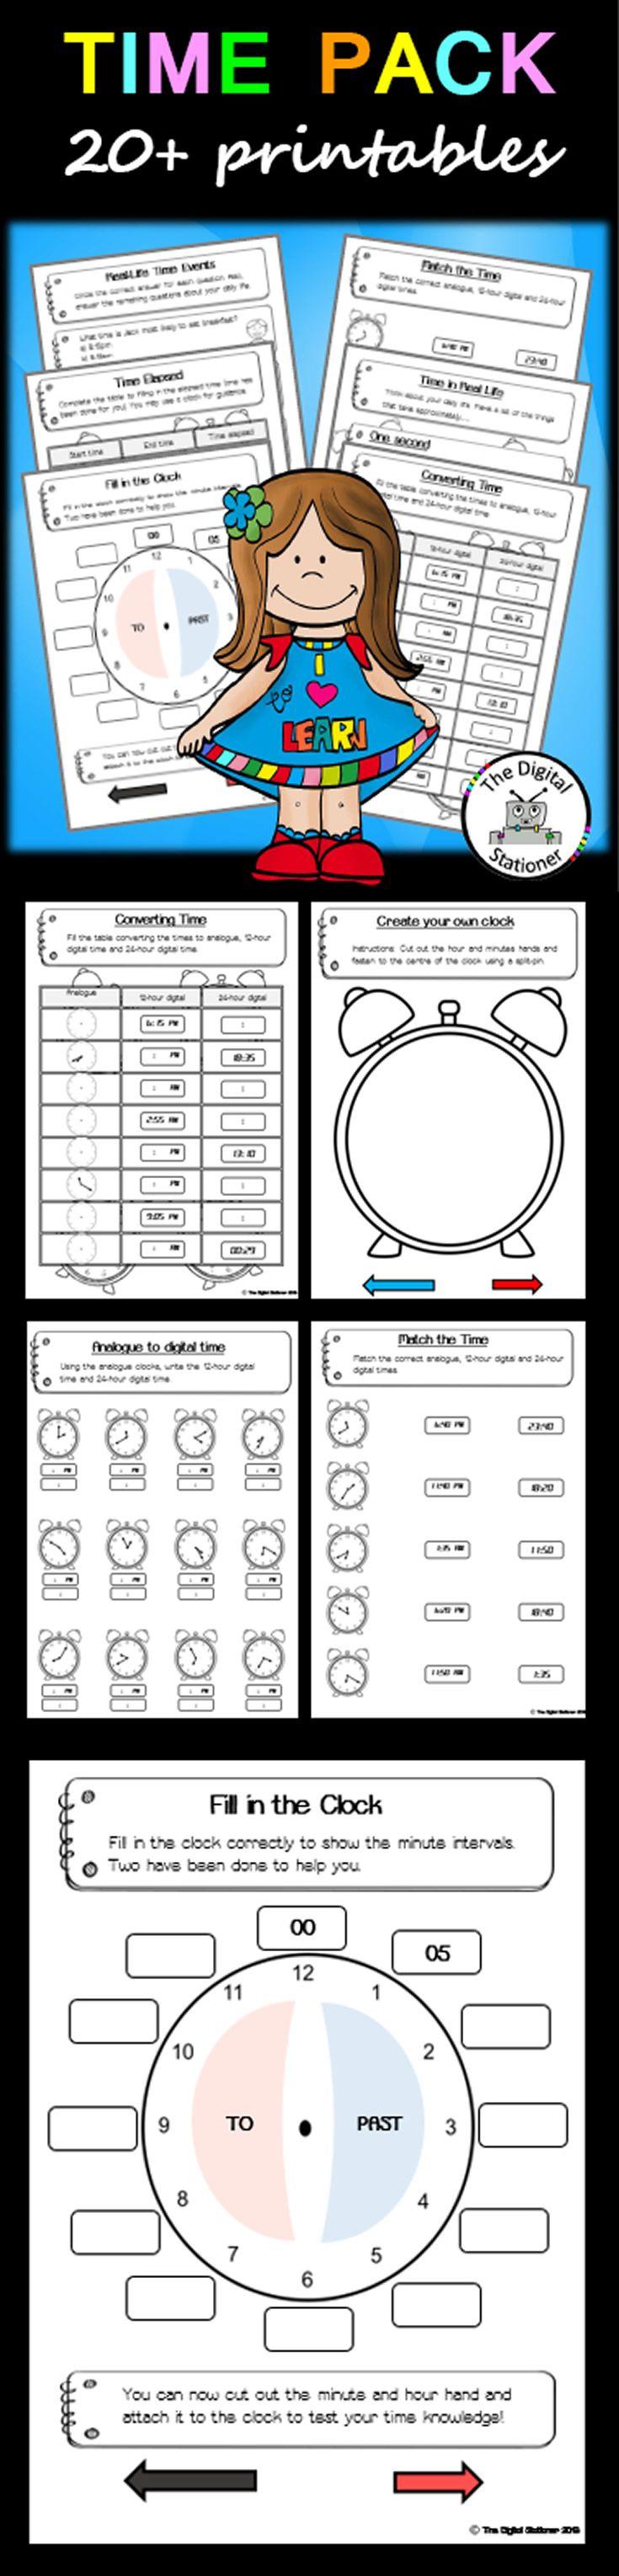 $2 - Telling the Time - 20+ worksheets printables (analog & digital) games maths teaching resources